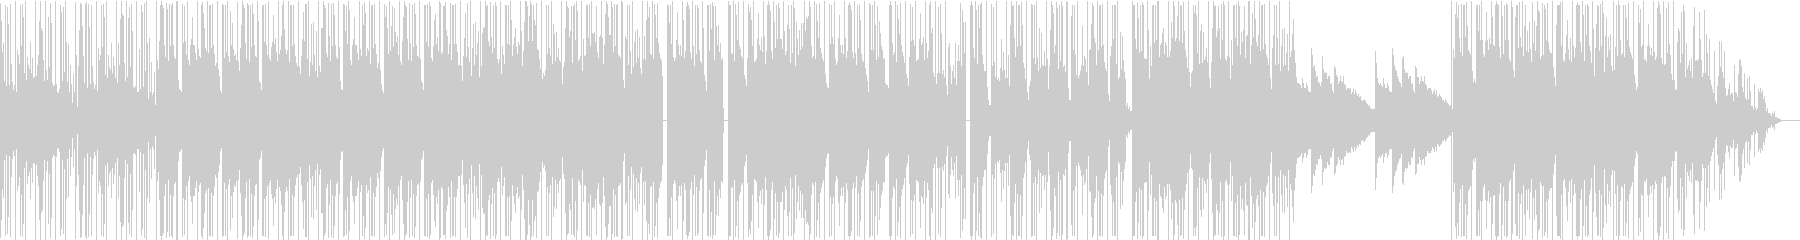 LoFiの未再生の波形